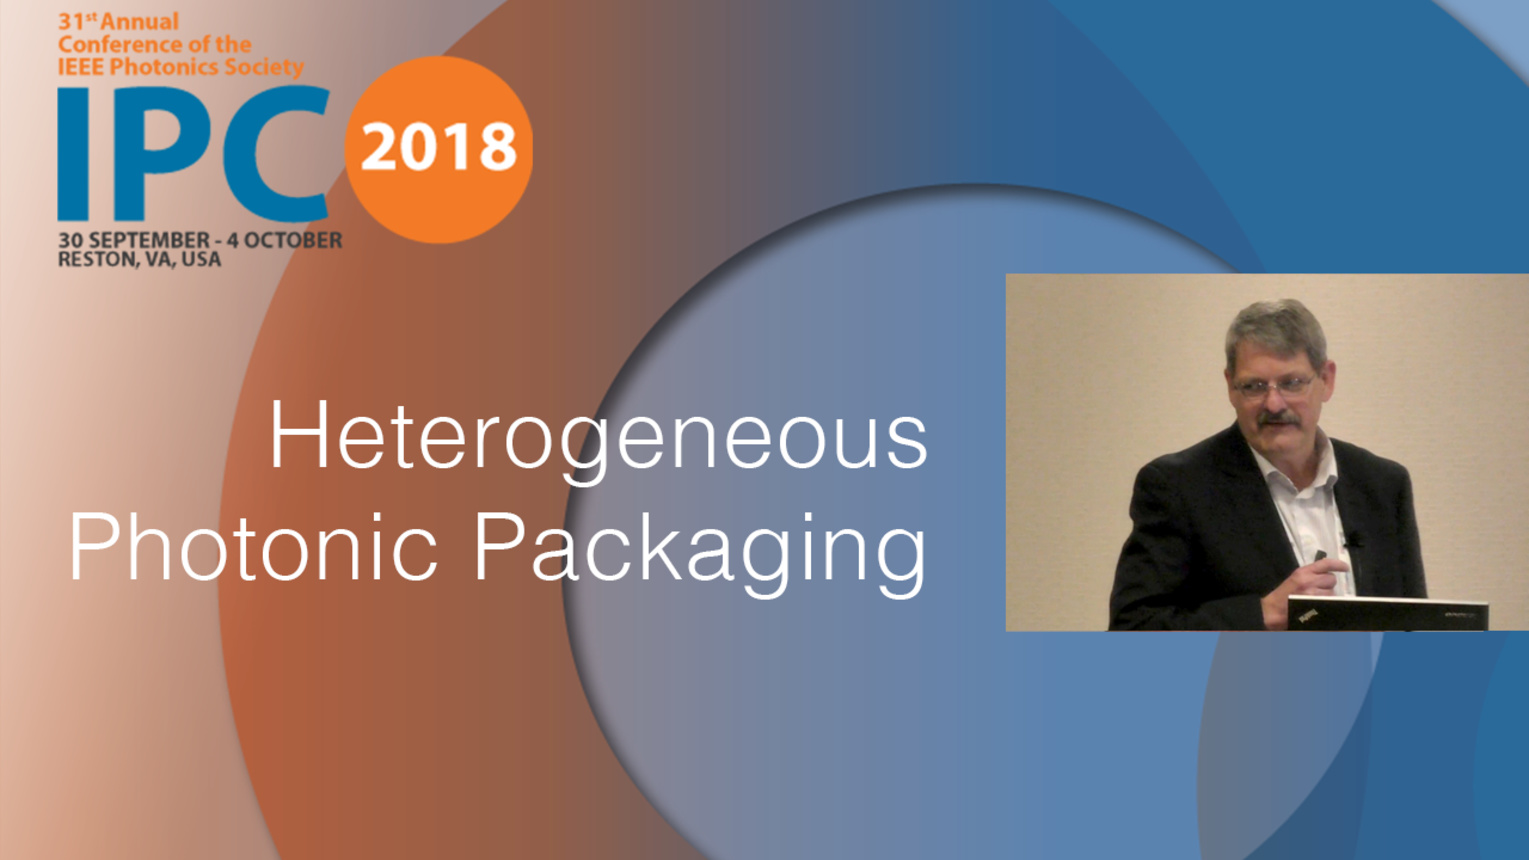 Heterogeneous Photonic Packaging - John Osenbach - IPC 2018